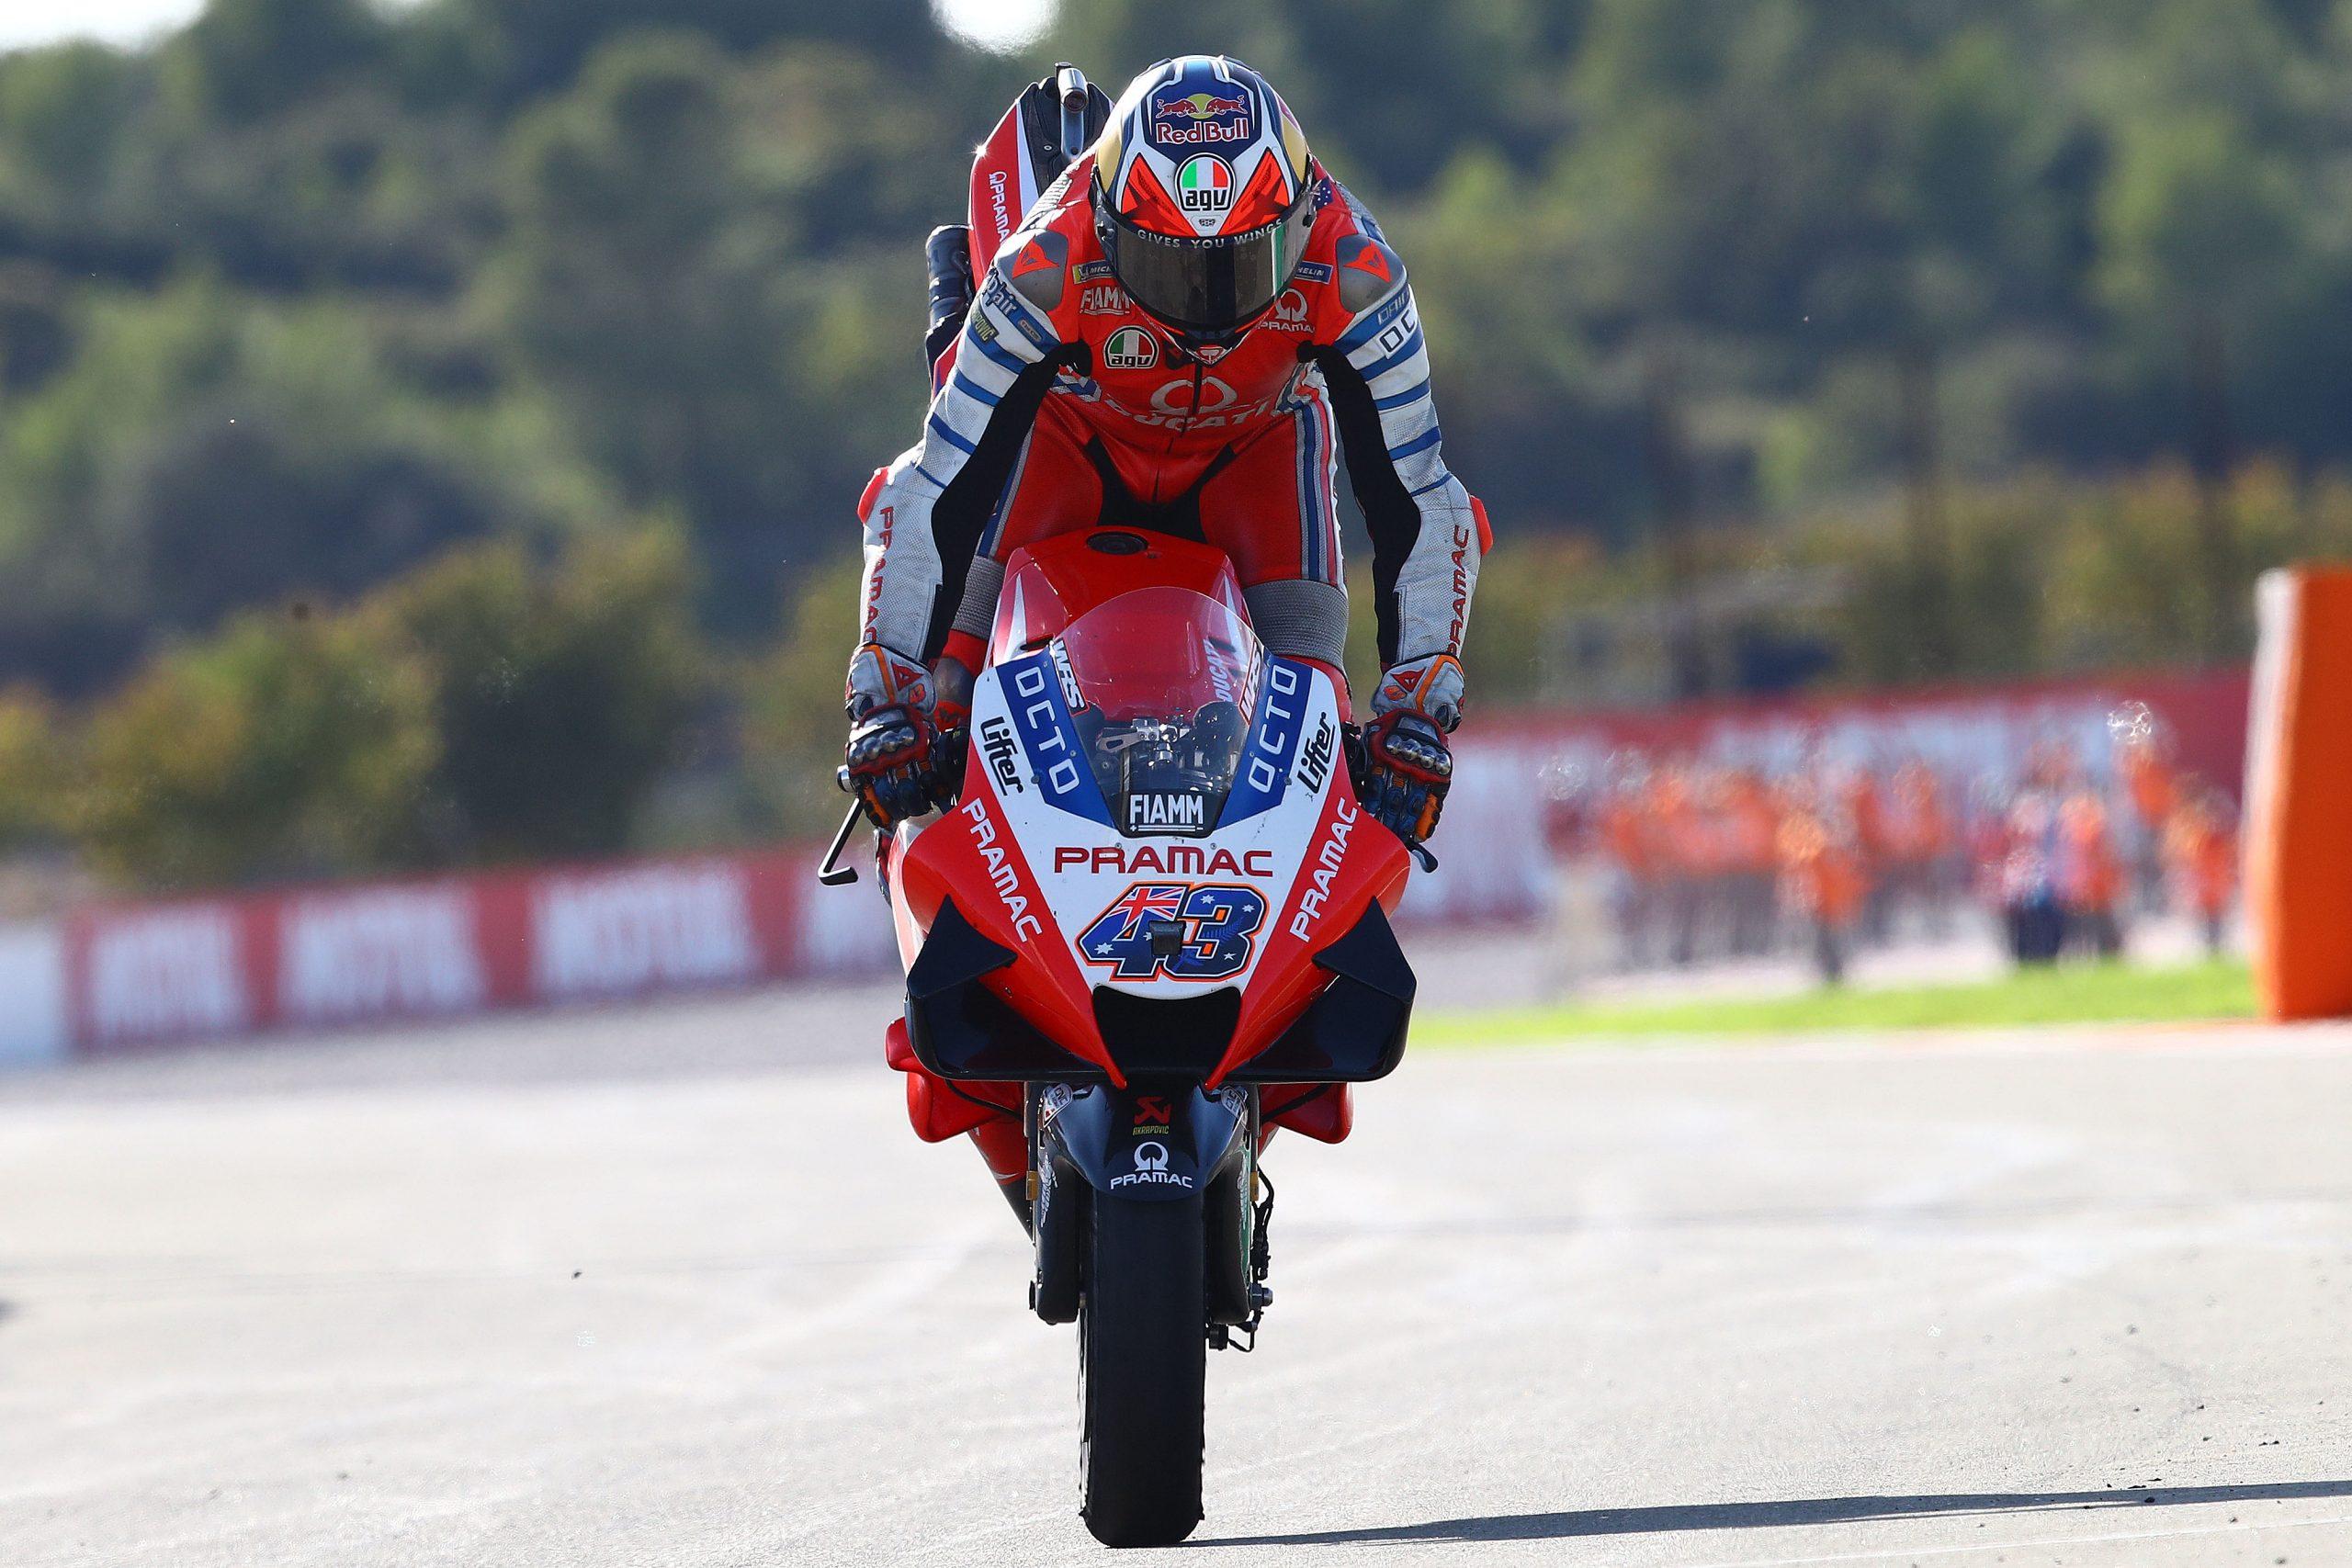 Jack Miller – stoppie po GP Walencji 2020